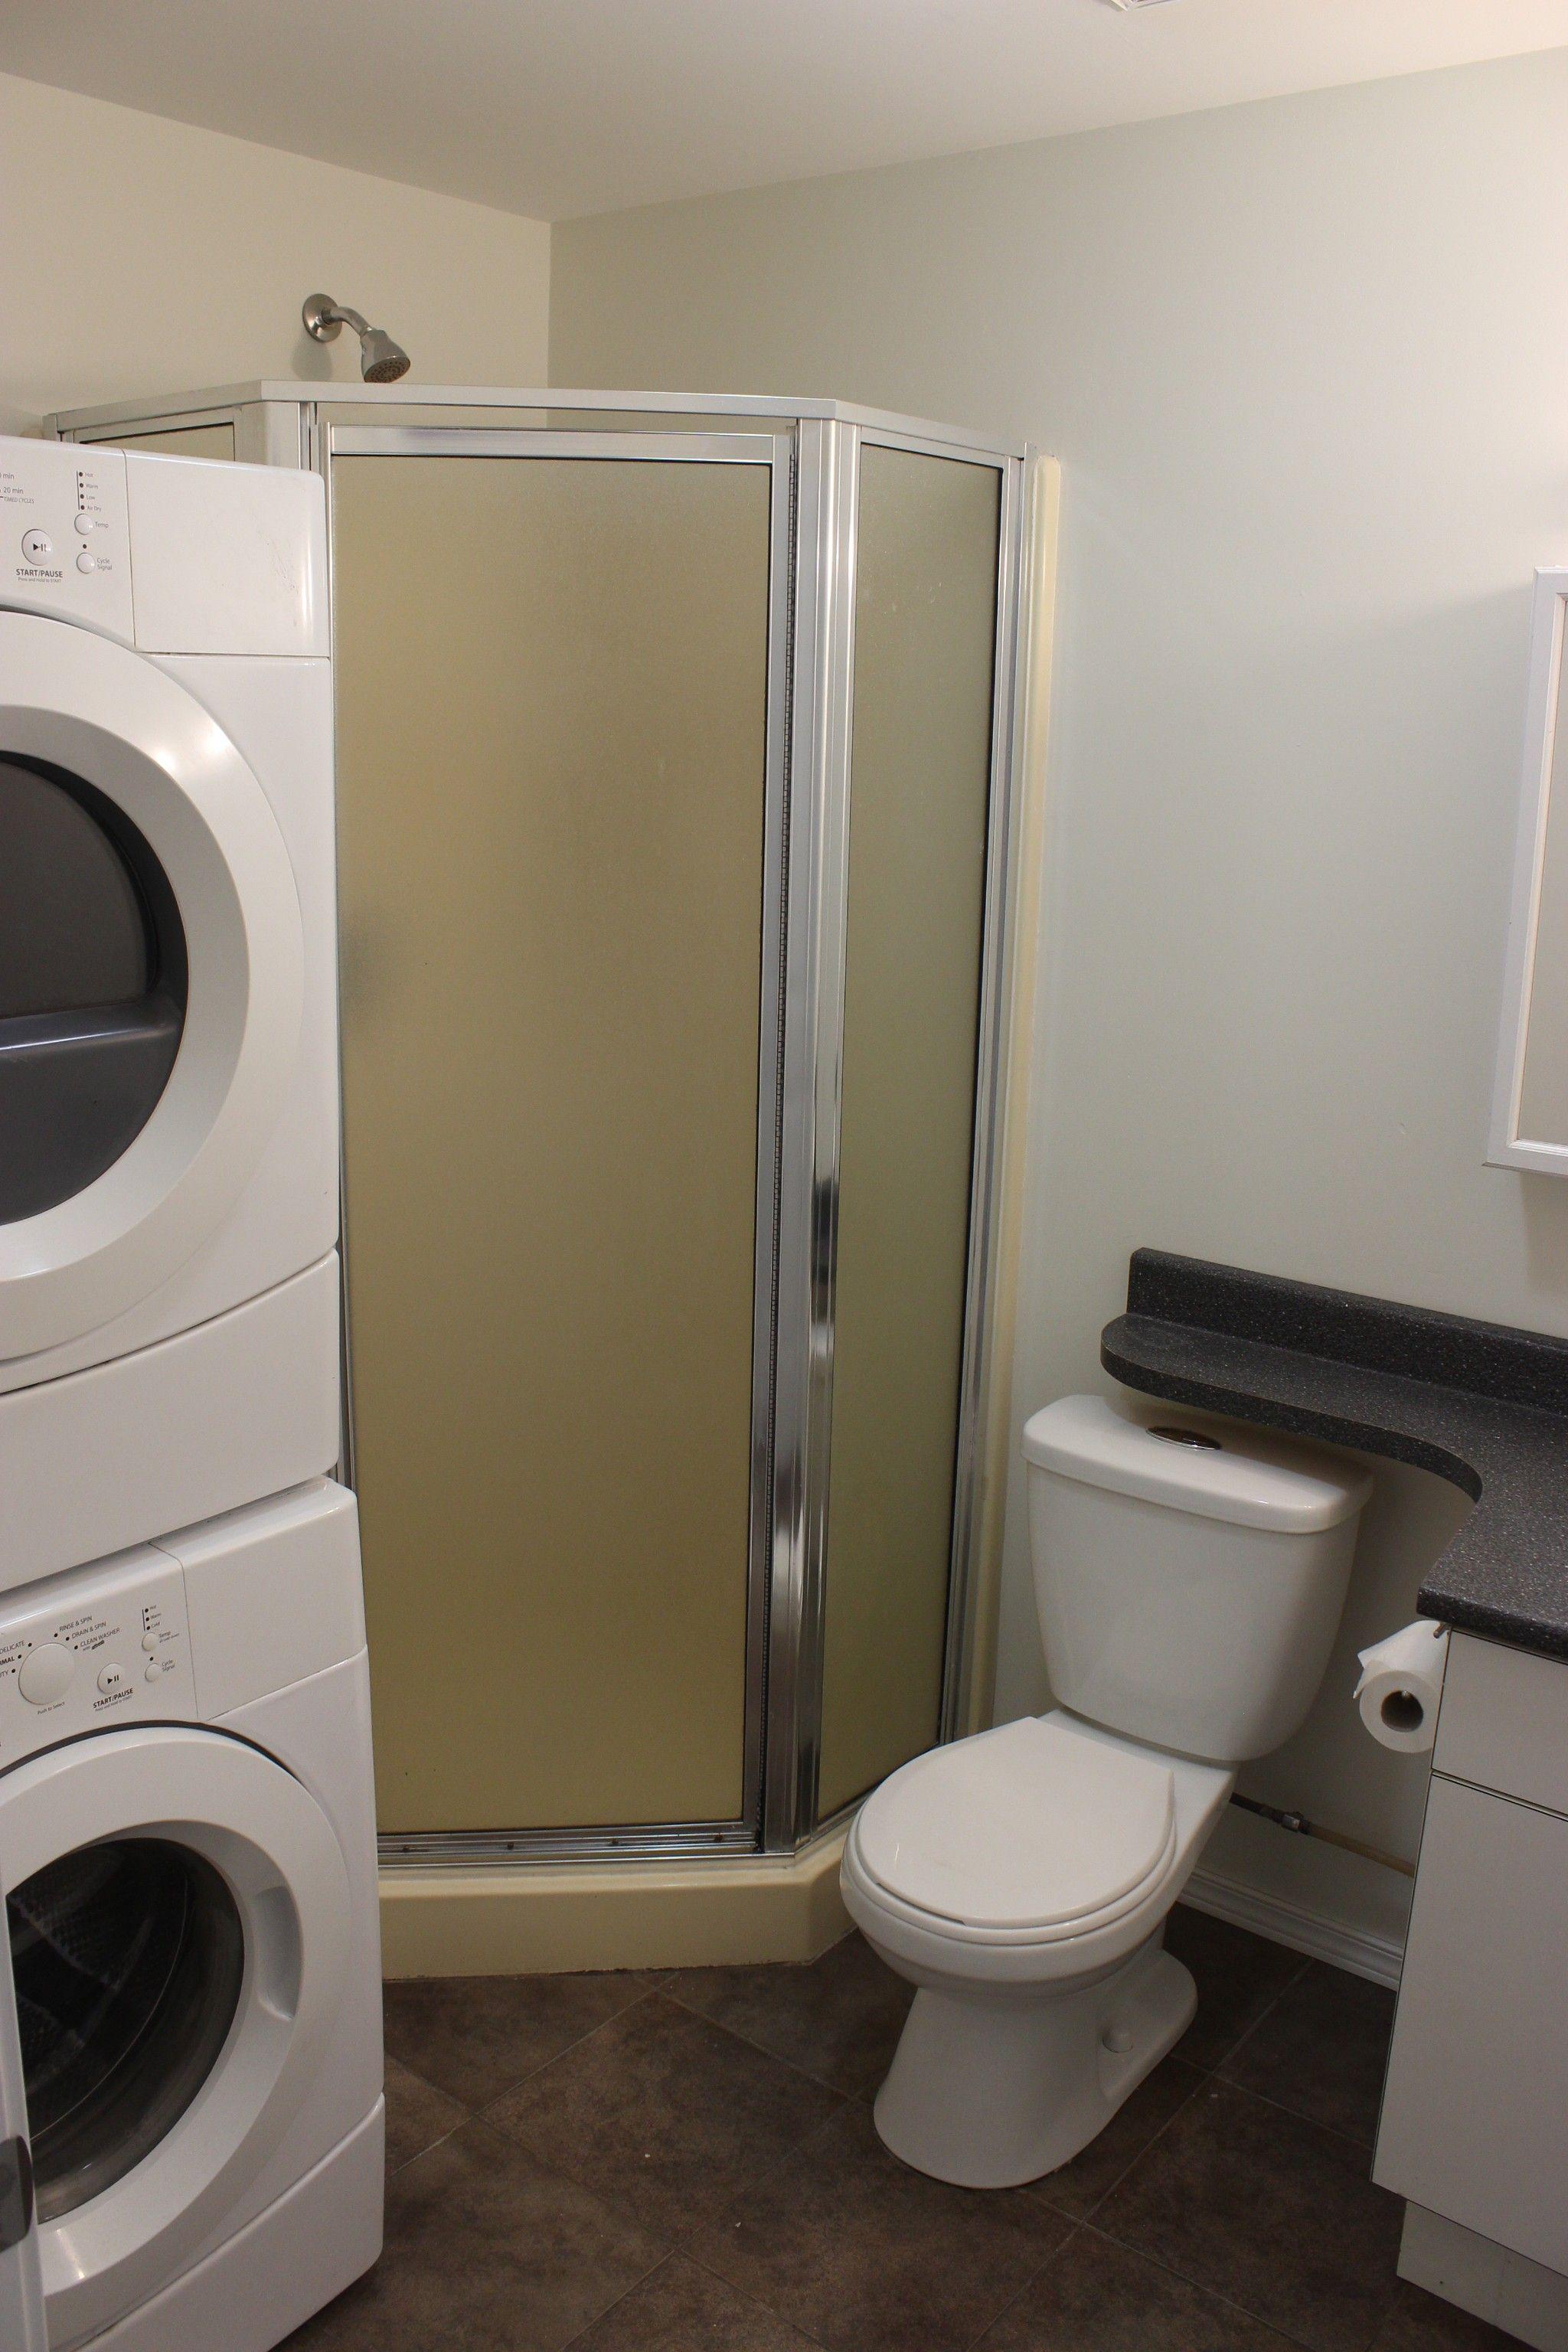 Photo 18: Photos: 317 Waddington Drive in Kamloops: Sahali 1/2 Duplex for sale : MLS®# 161942